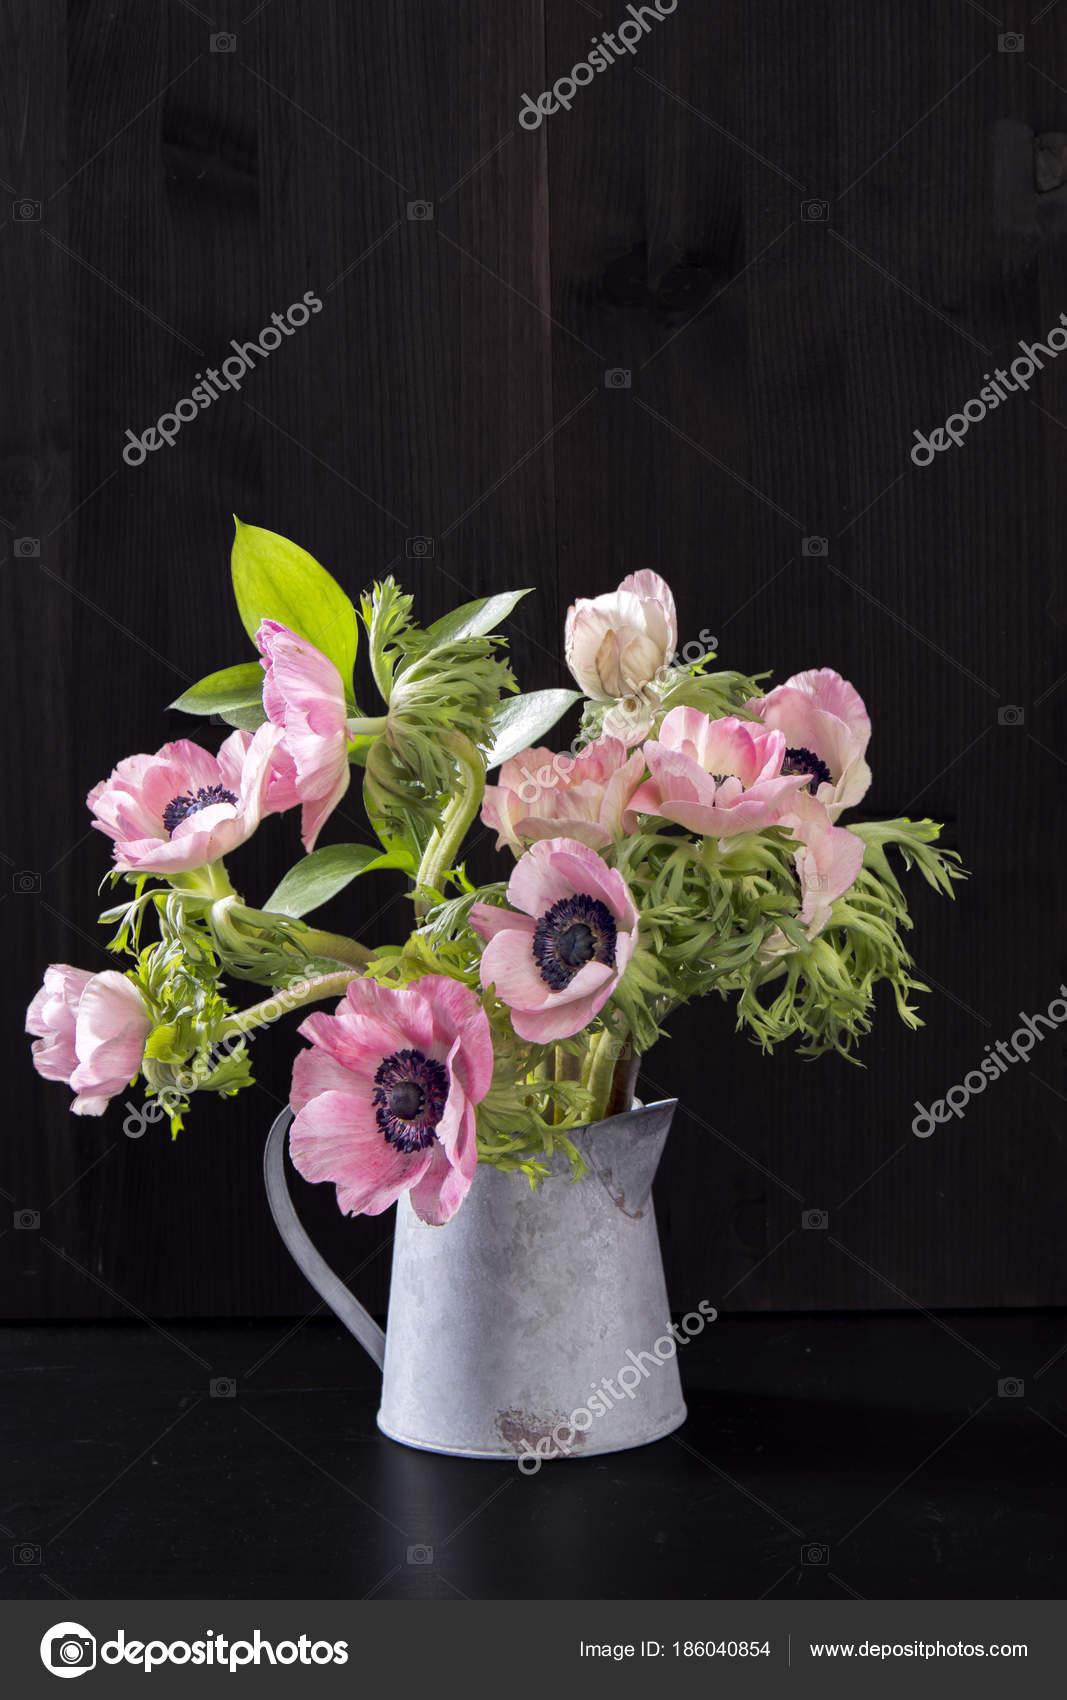 The wedding bouquet of anemones with ruscus in a jug on a black the wedding bouquet of anemones with ruscus in a jug on a black background stock izmirmasajfo